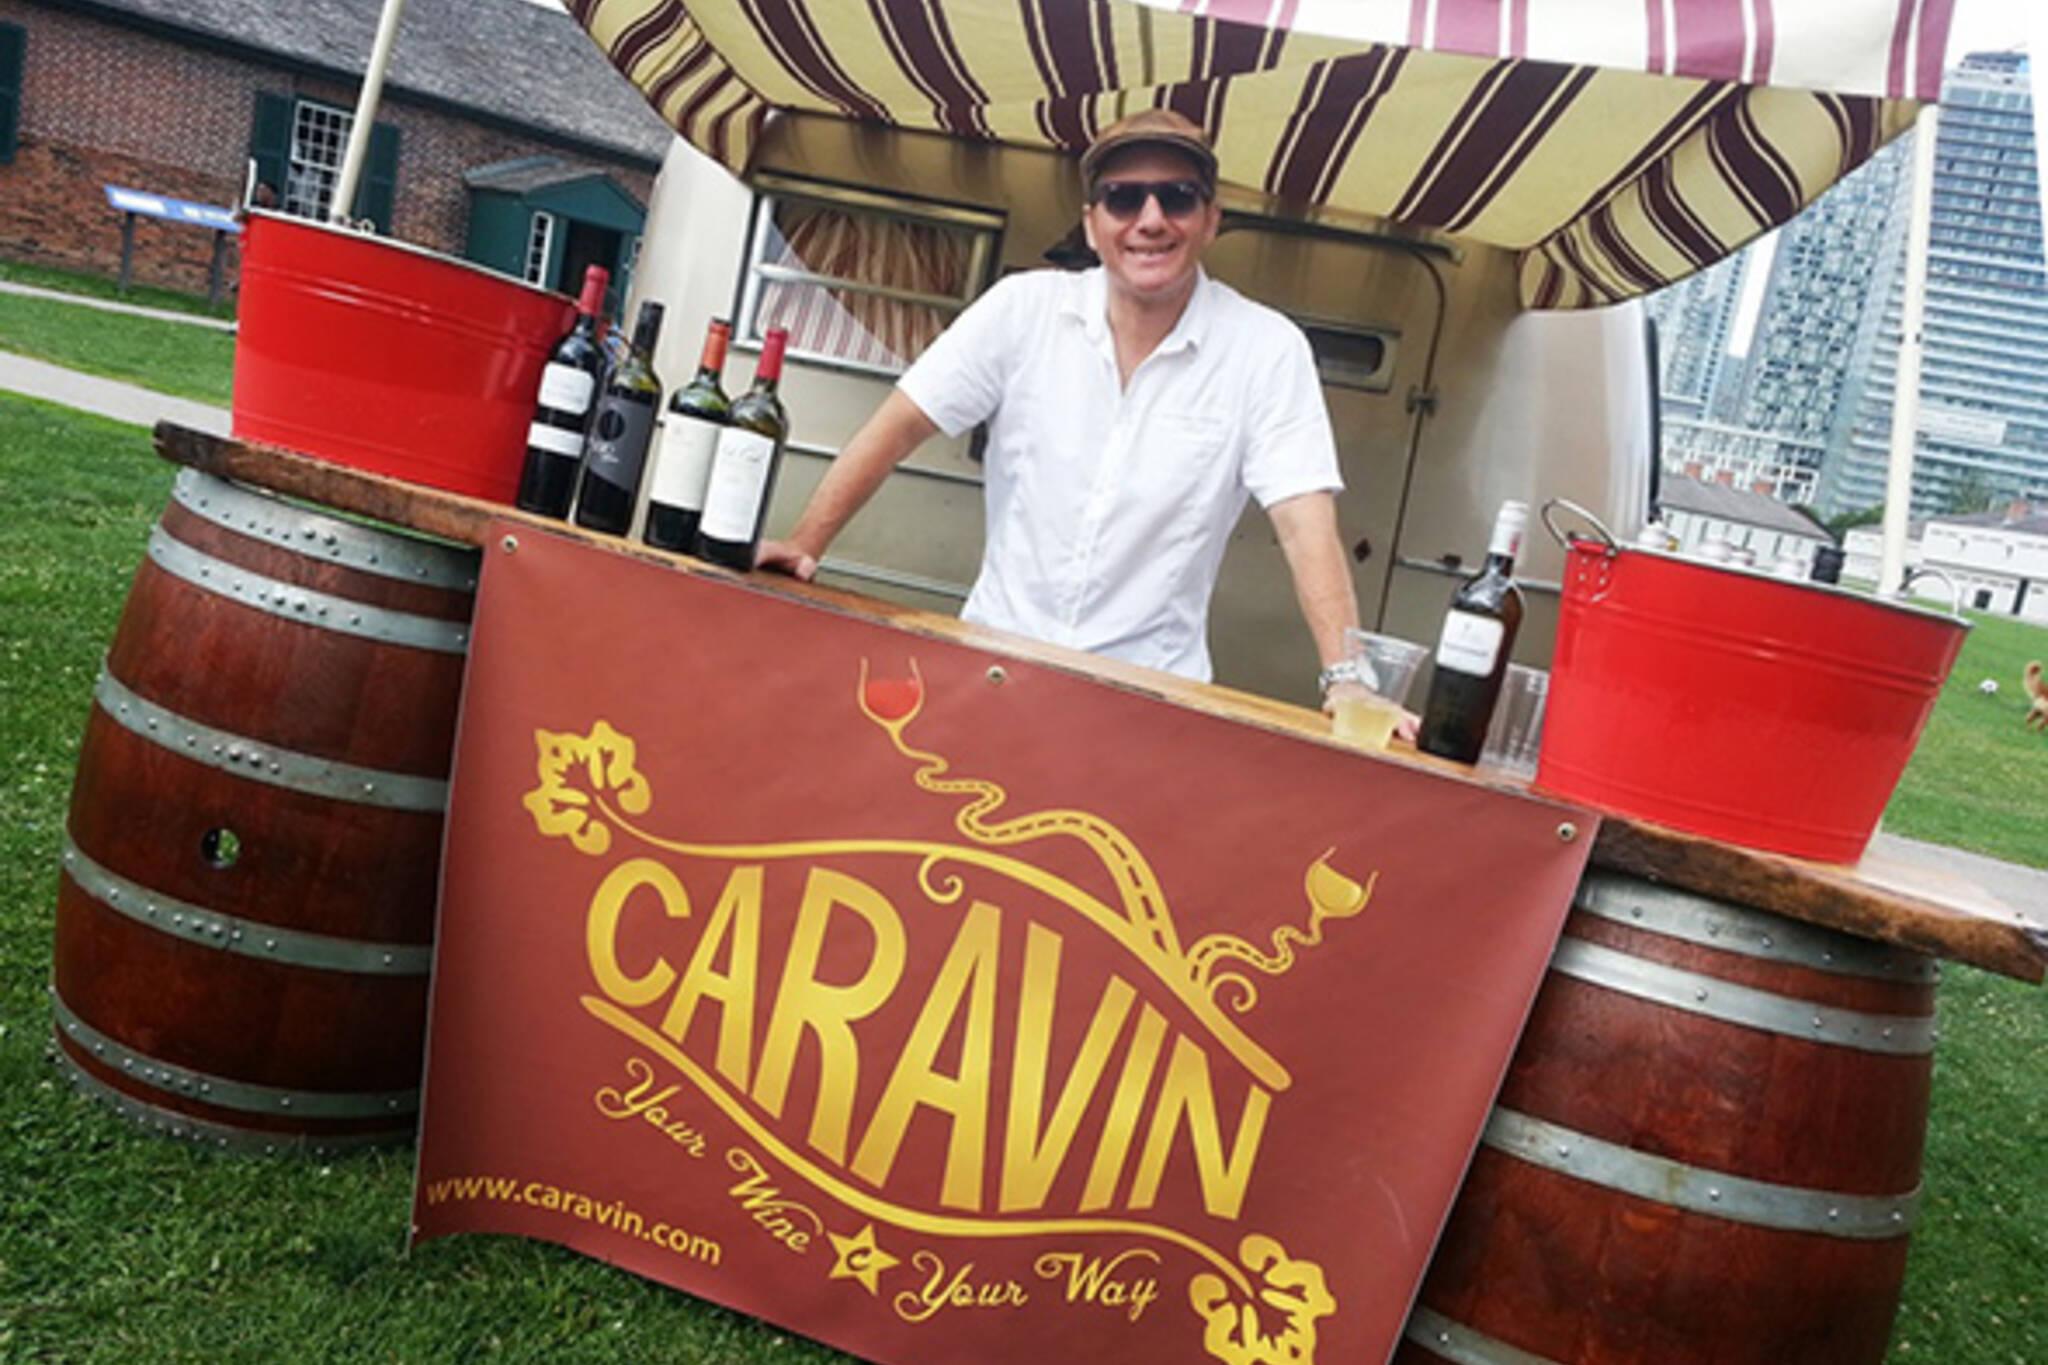 Caravin Mobile Wine Bar